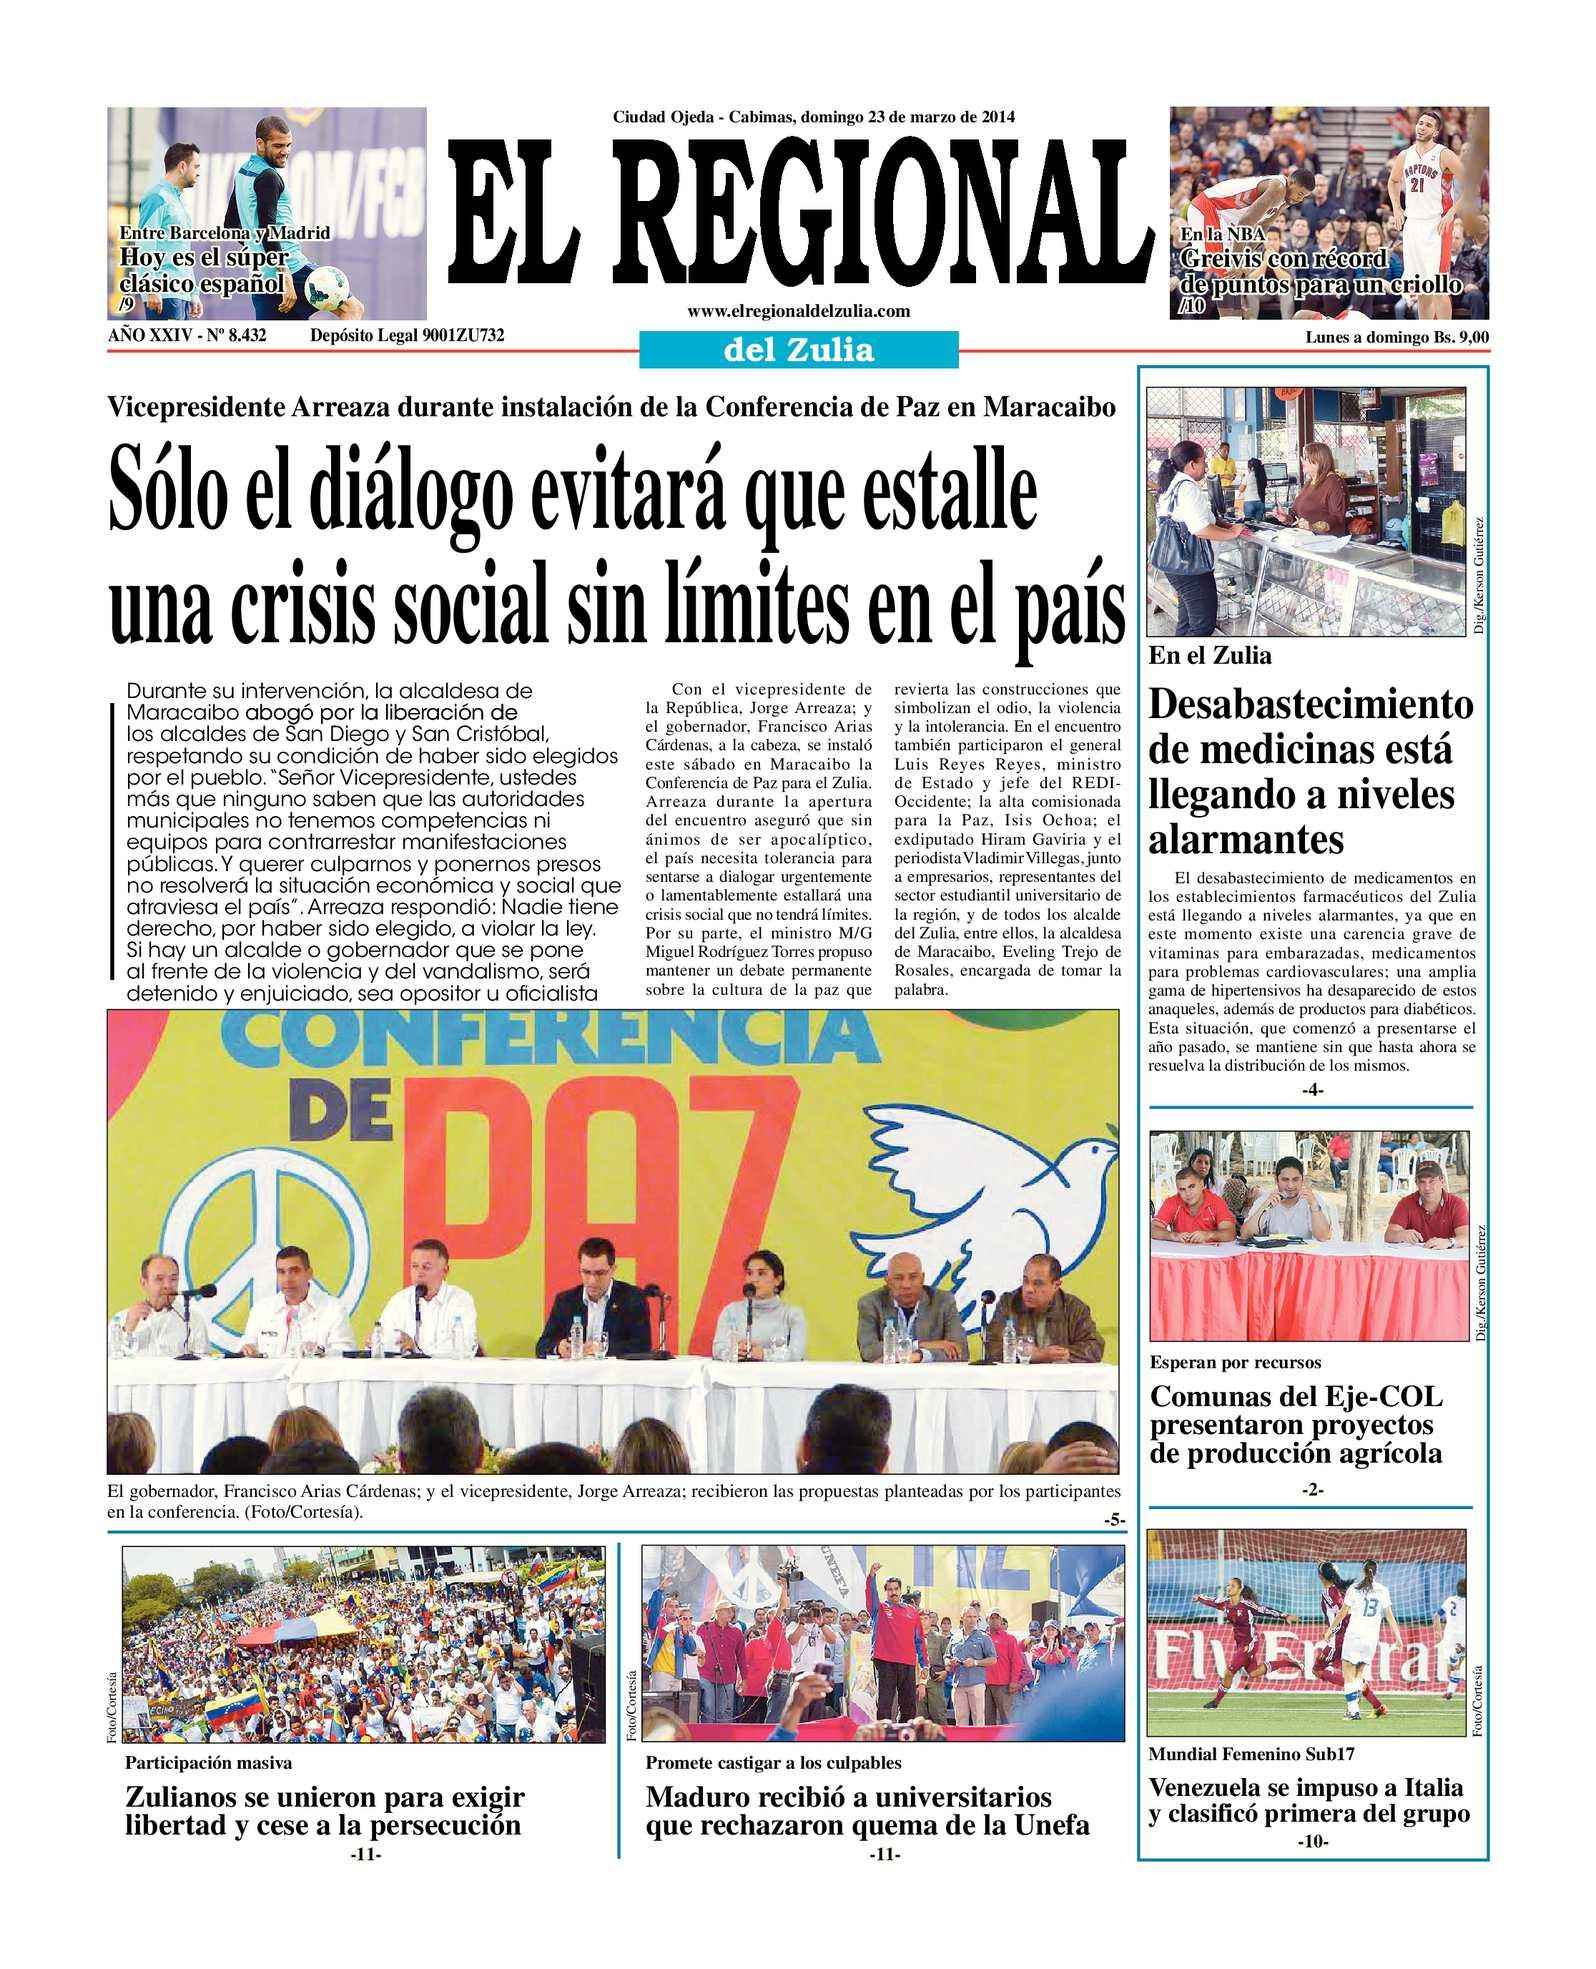 Calaméo - El regional del zulia 23-03-2014